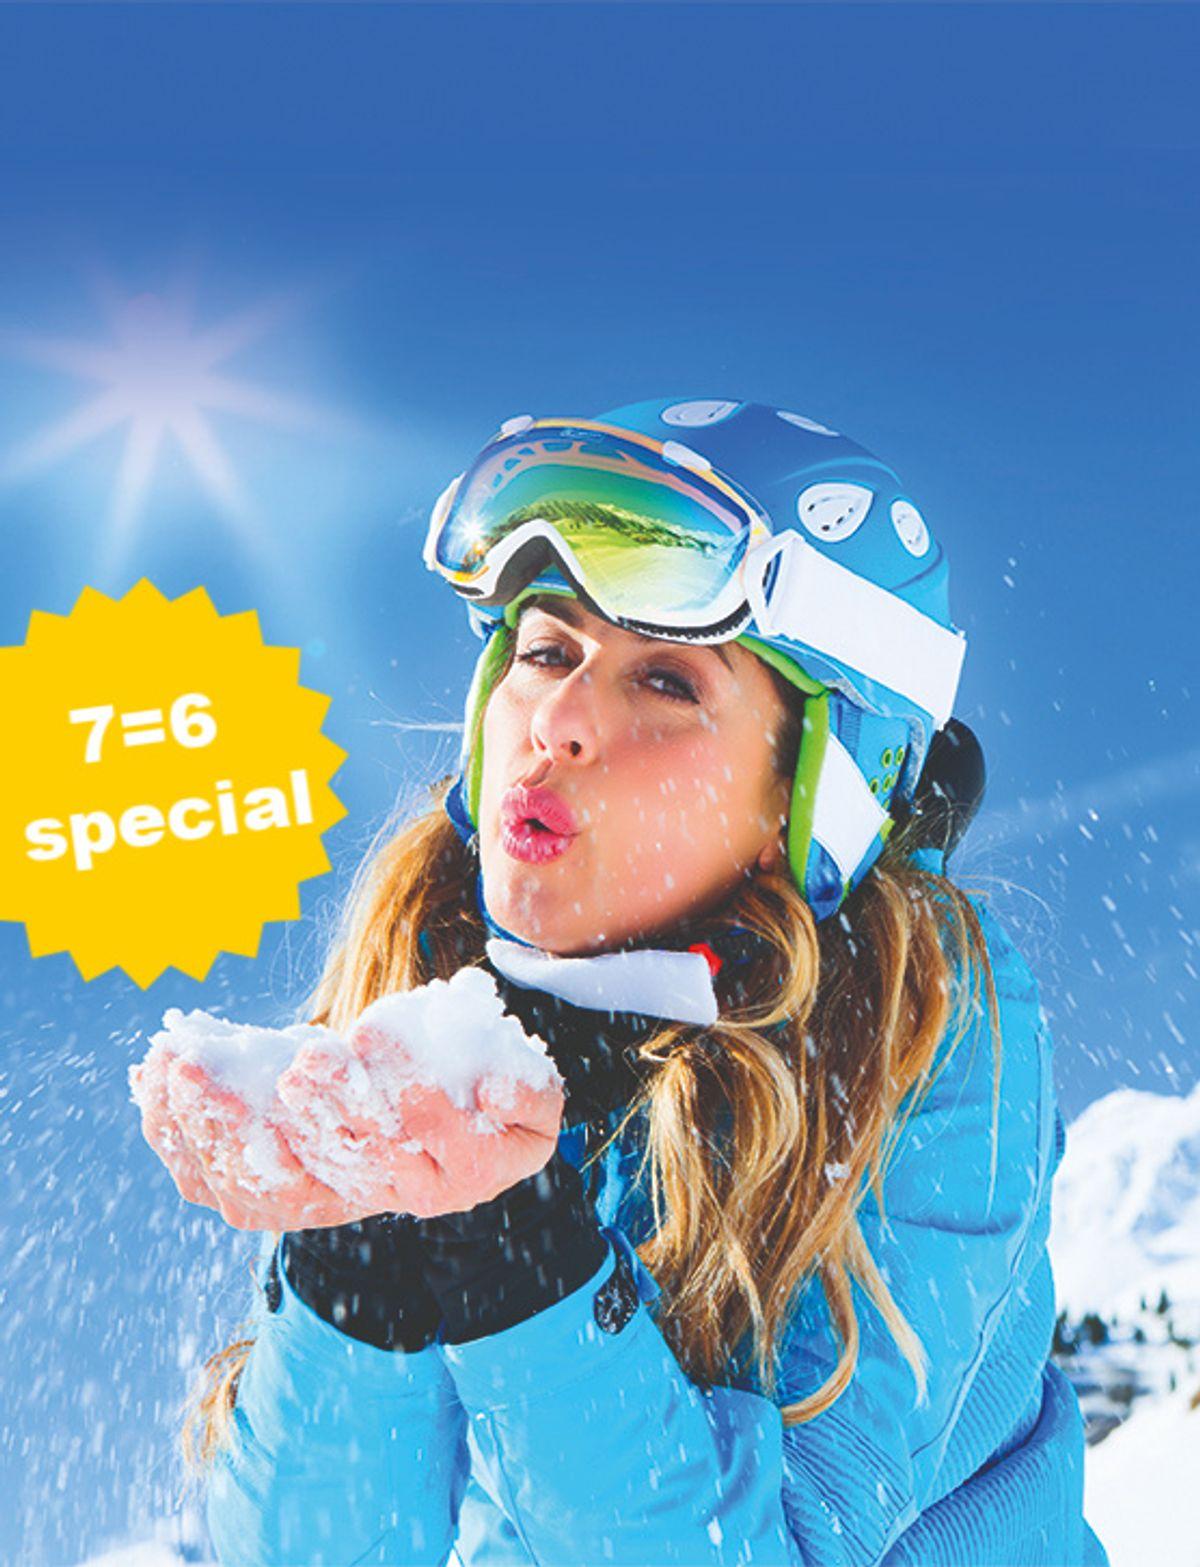 Ski Classic Deluxe 7=6 Special | 1 Tag & 1 Nacht geschenkt